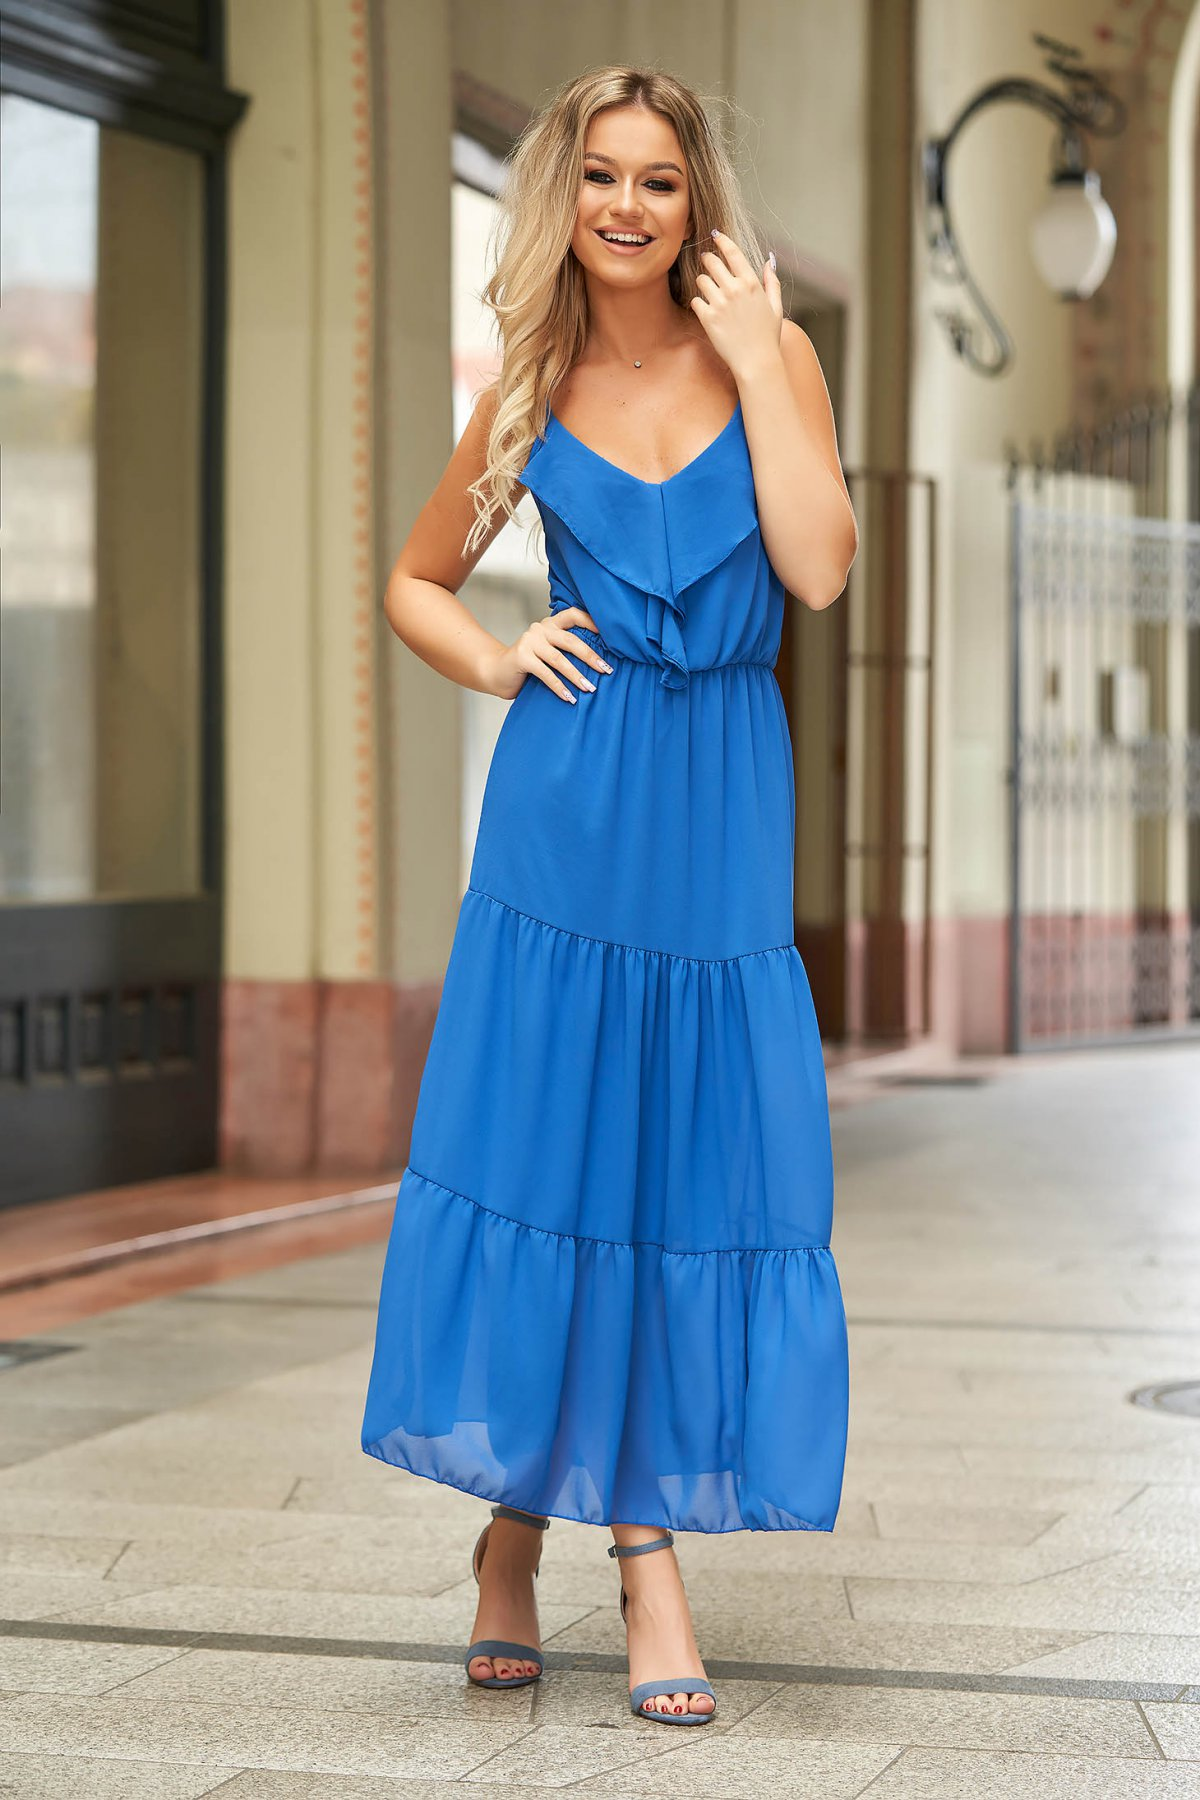 Rochie albastra lunga de zi din voal fara maneci cu volanase